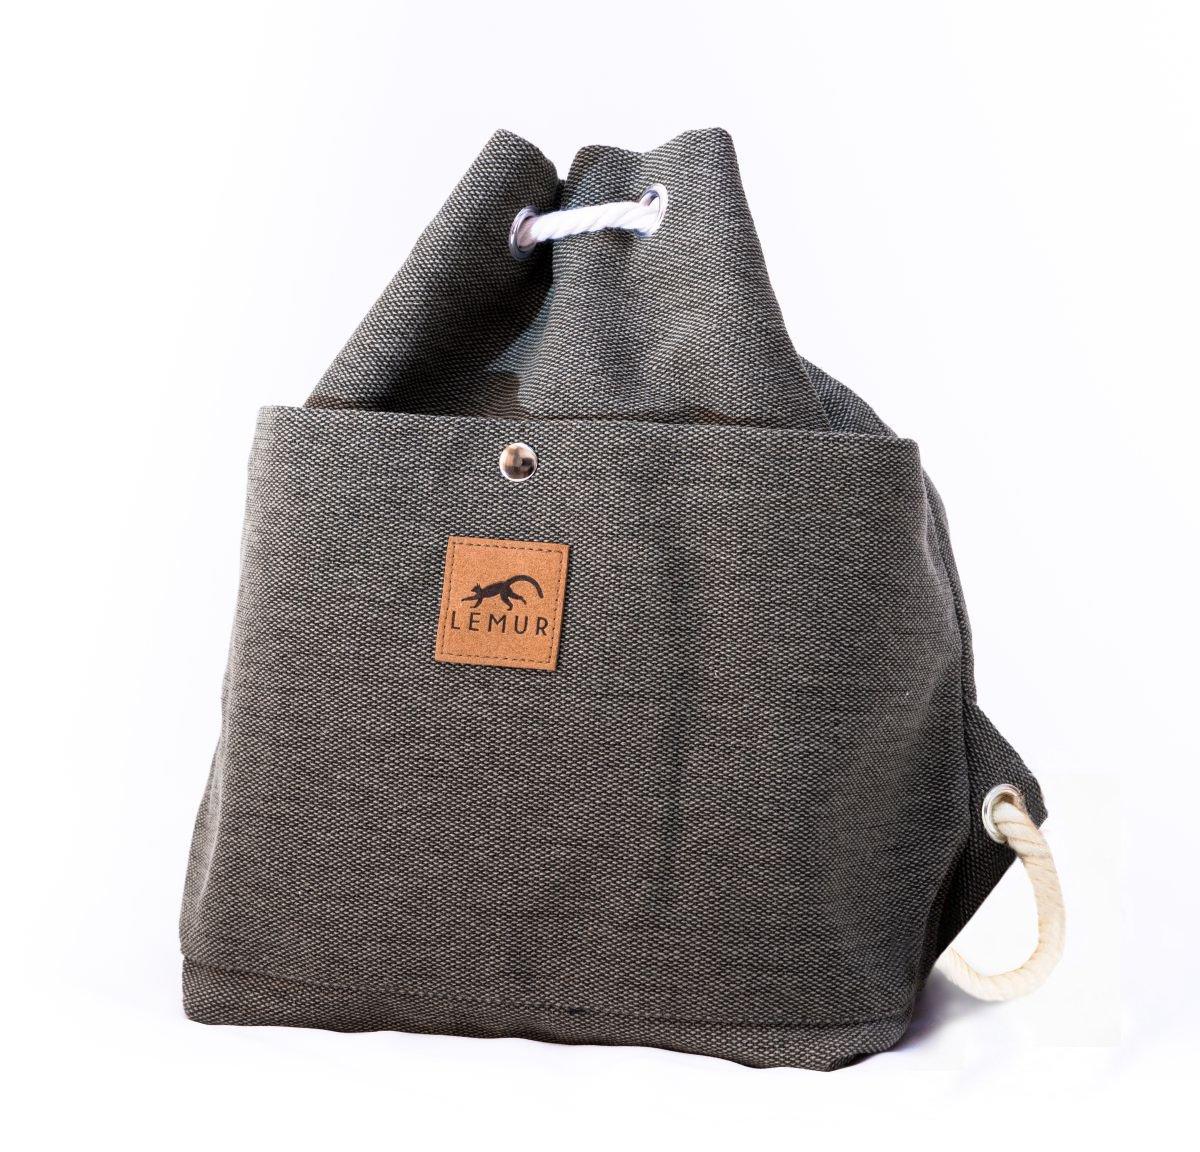 Canvas Drawstring Bucket Bag - Shoulder Day Bag, Backpack by Lemur Bags (Stone Gray)